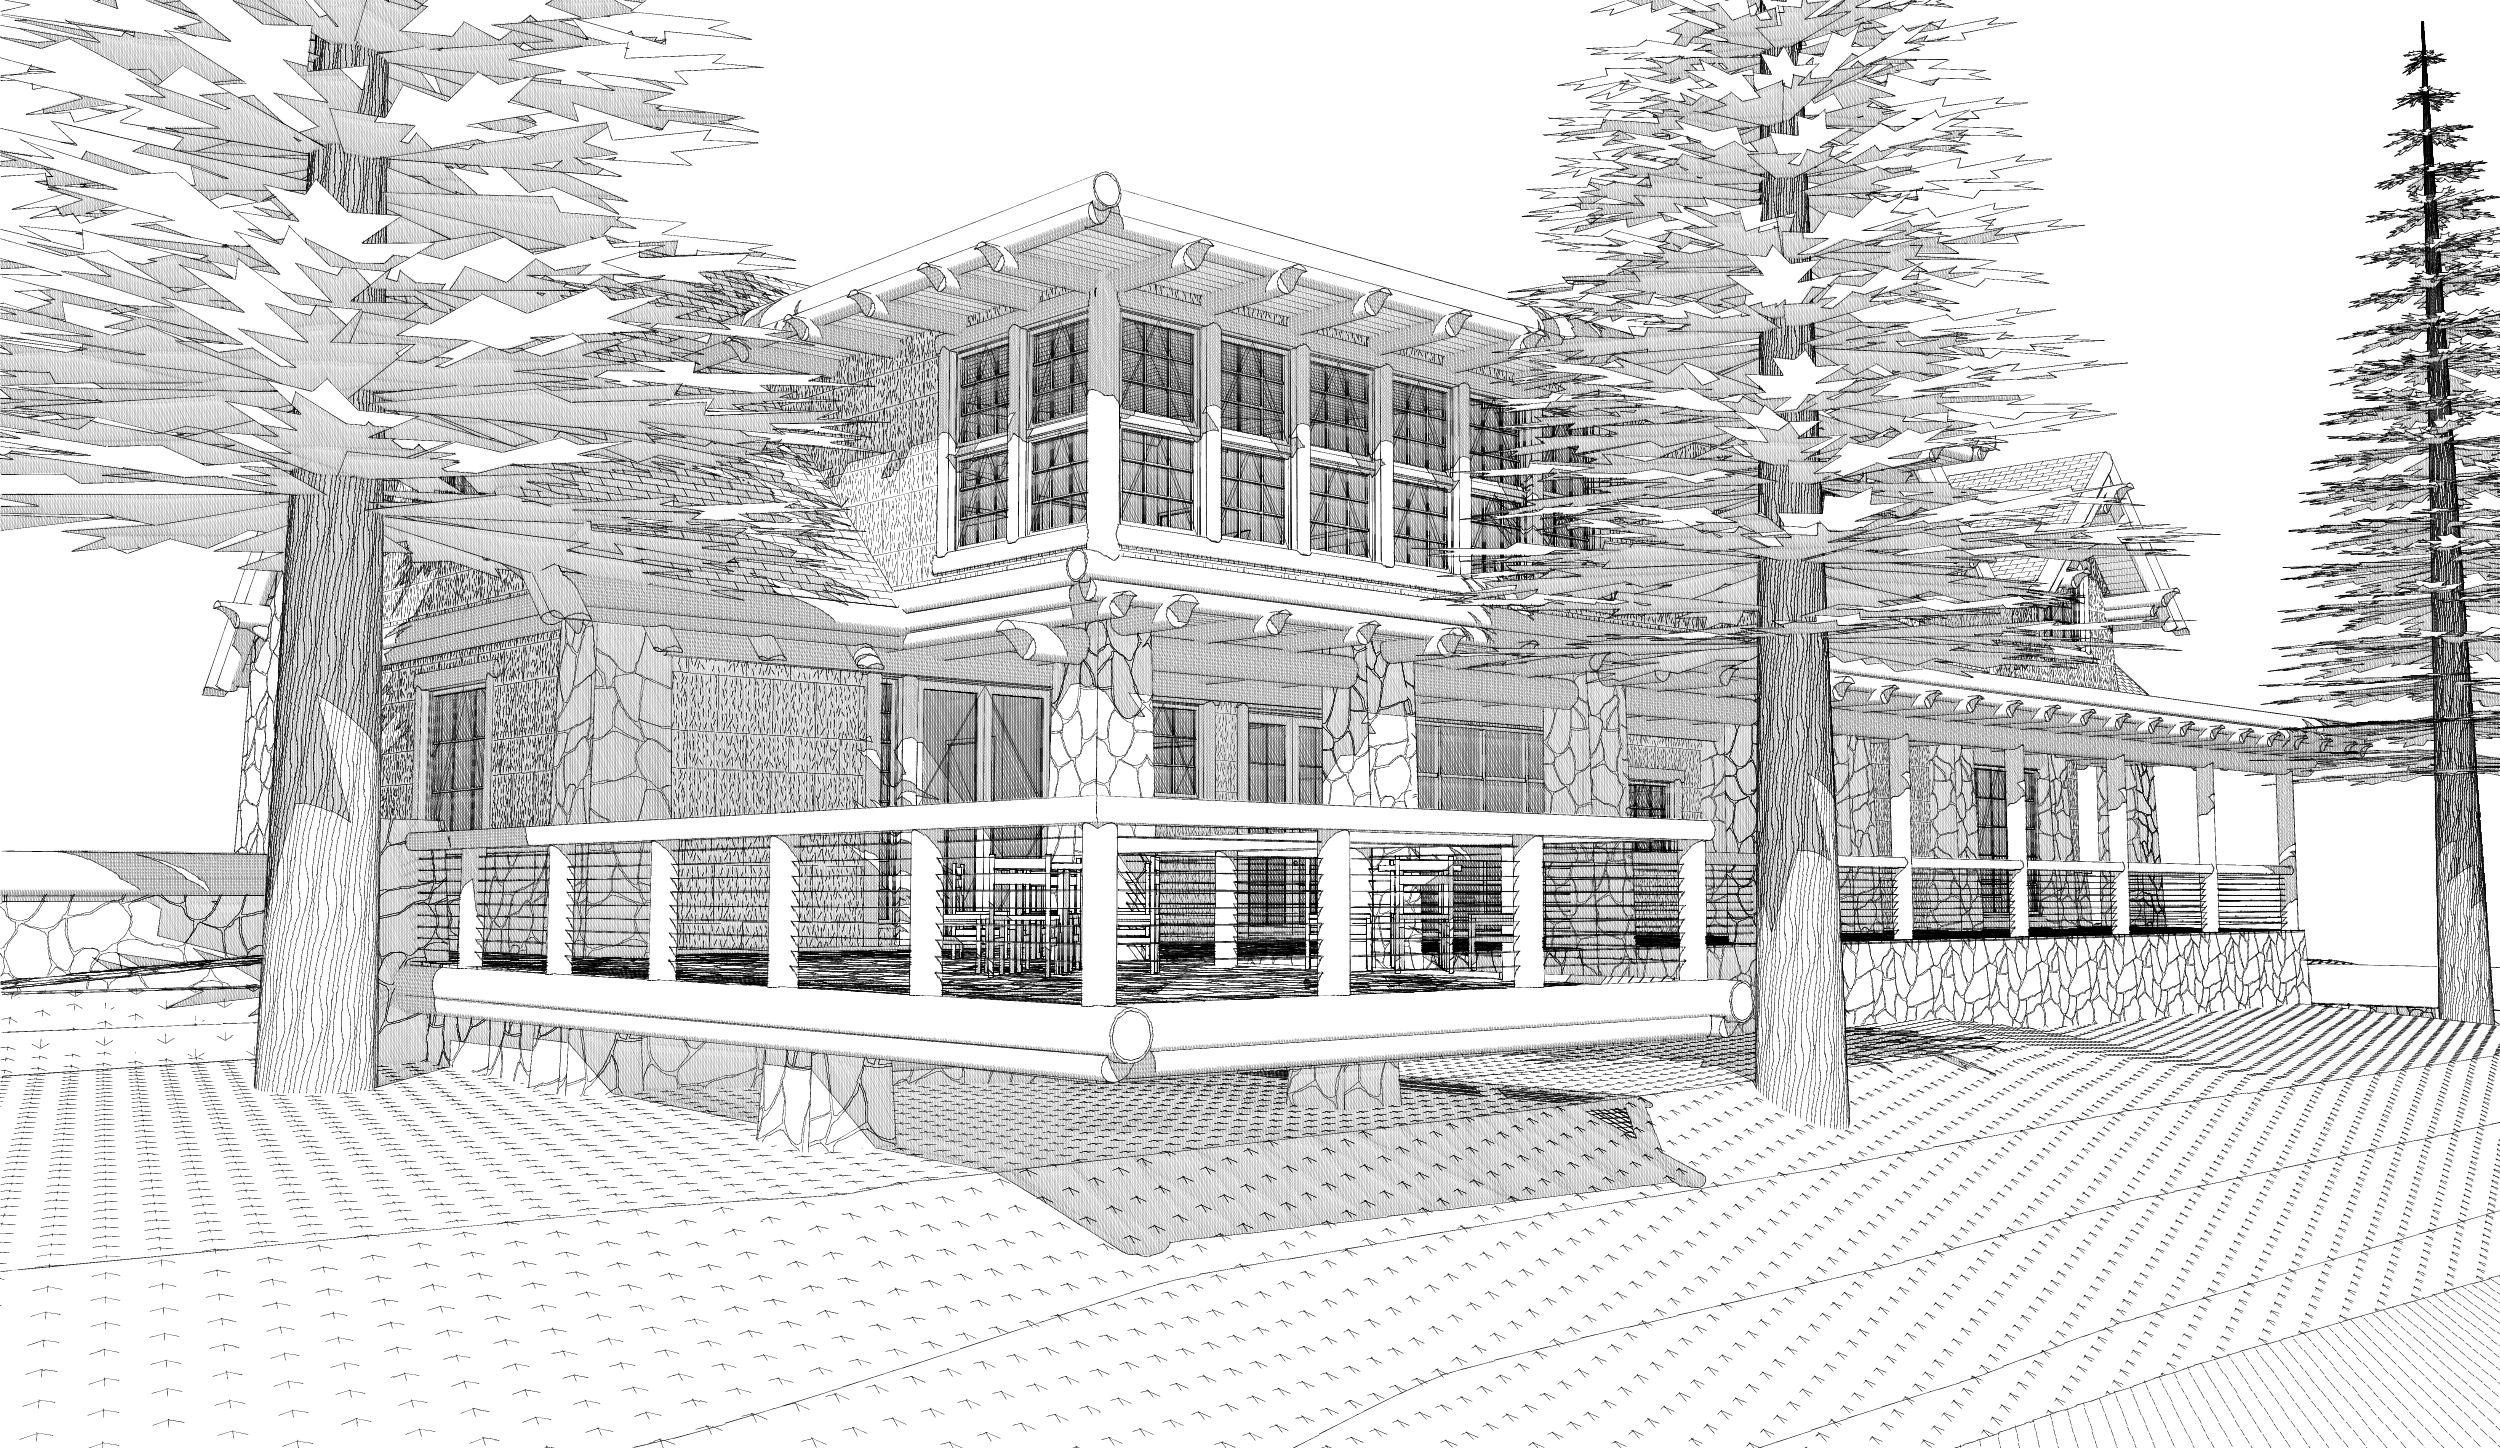 ARCHITECT RUSTIC DESIGN HOUSE NC 01.jpg